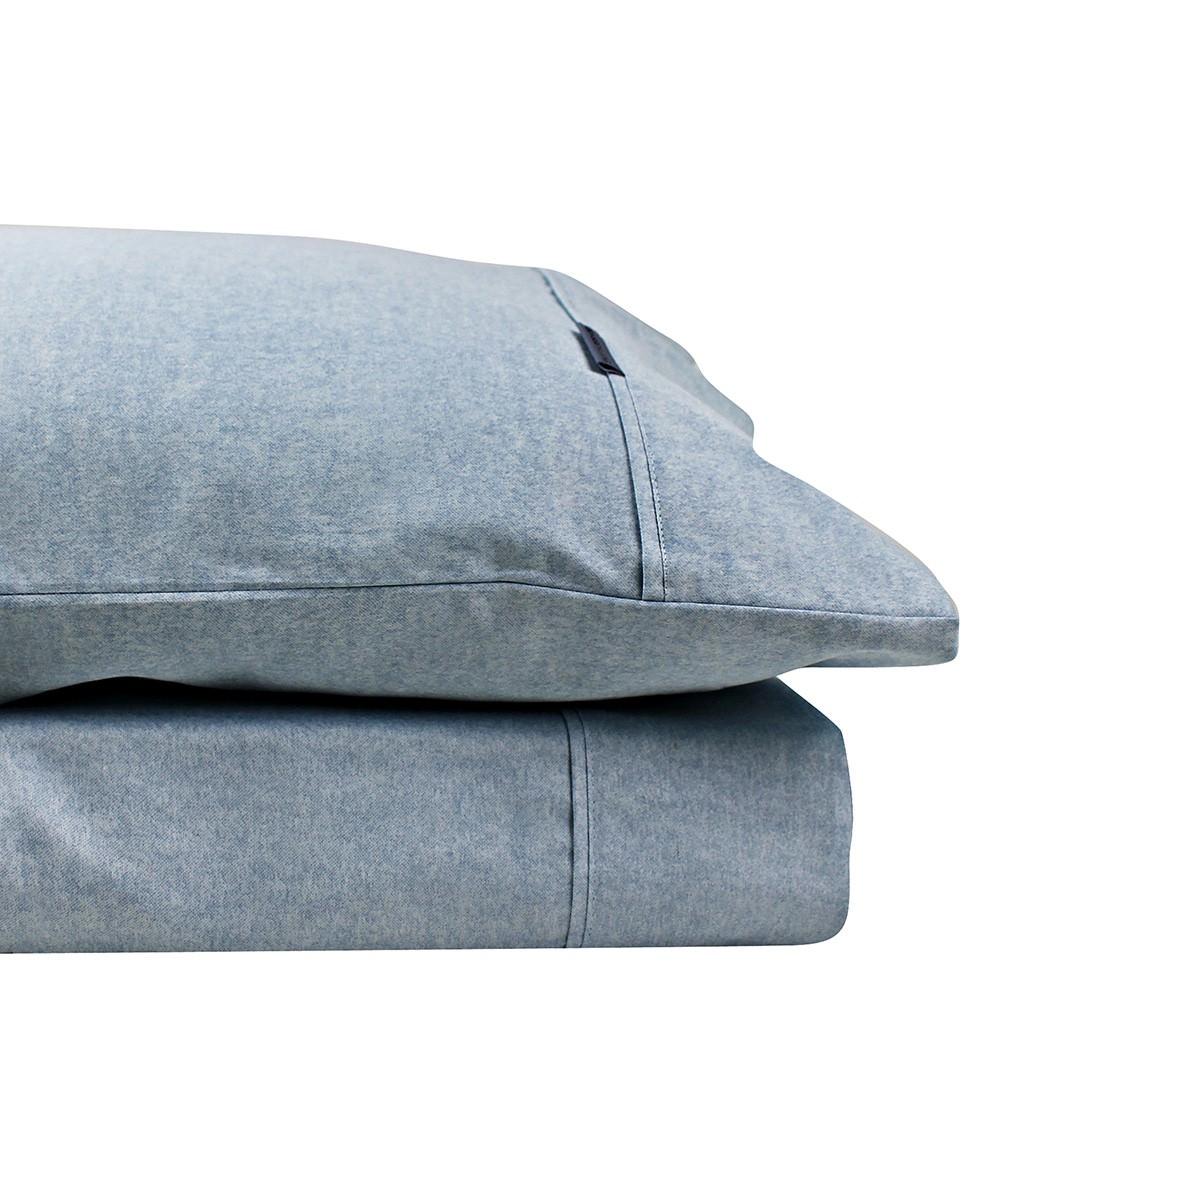 Odyssey Living Marle 1000TC Cotton Rich Sheet Set, Queen, Navy